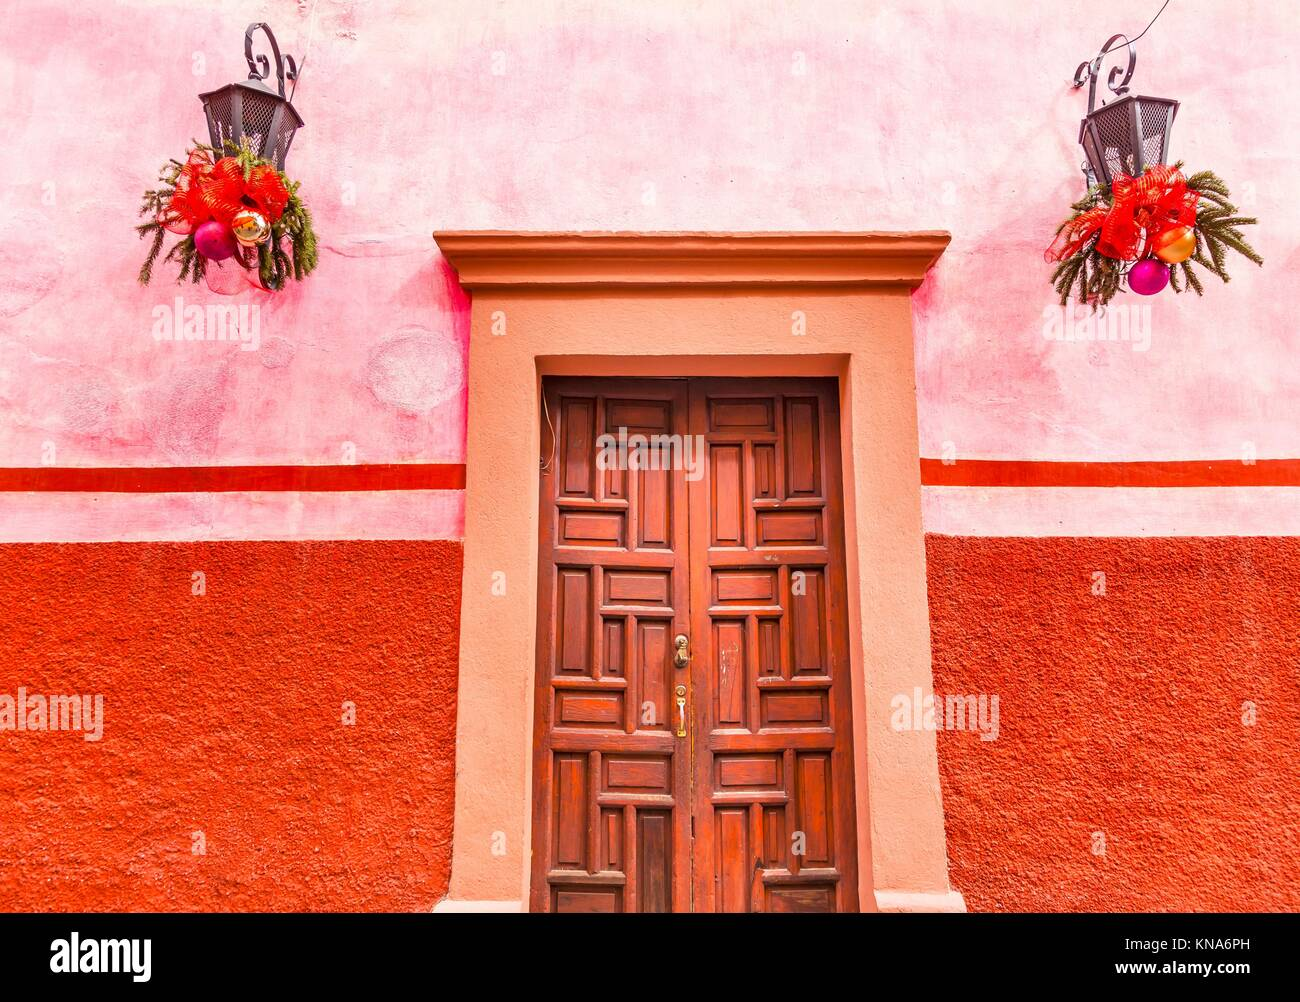 rosa rote wand braunen t r weihnachtsschmuck san miguel de allende mexiko stockfoto bild. Black Bedroom Furniture Sets. Home Design Ideas